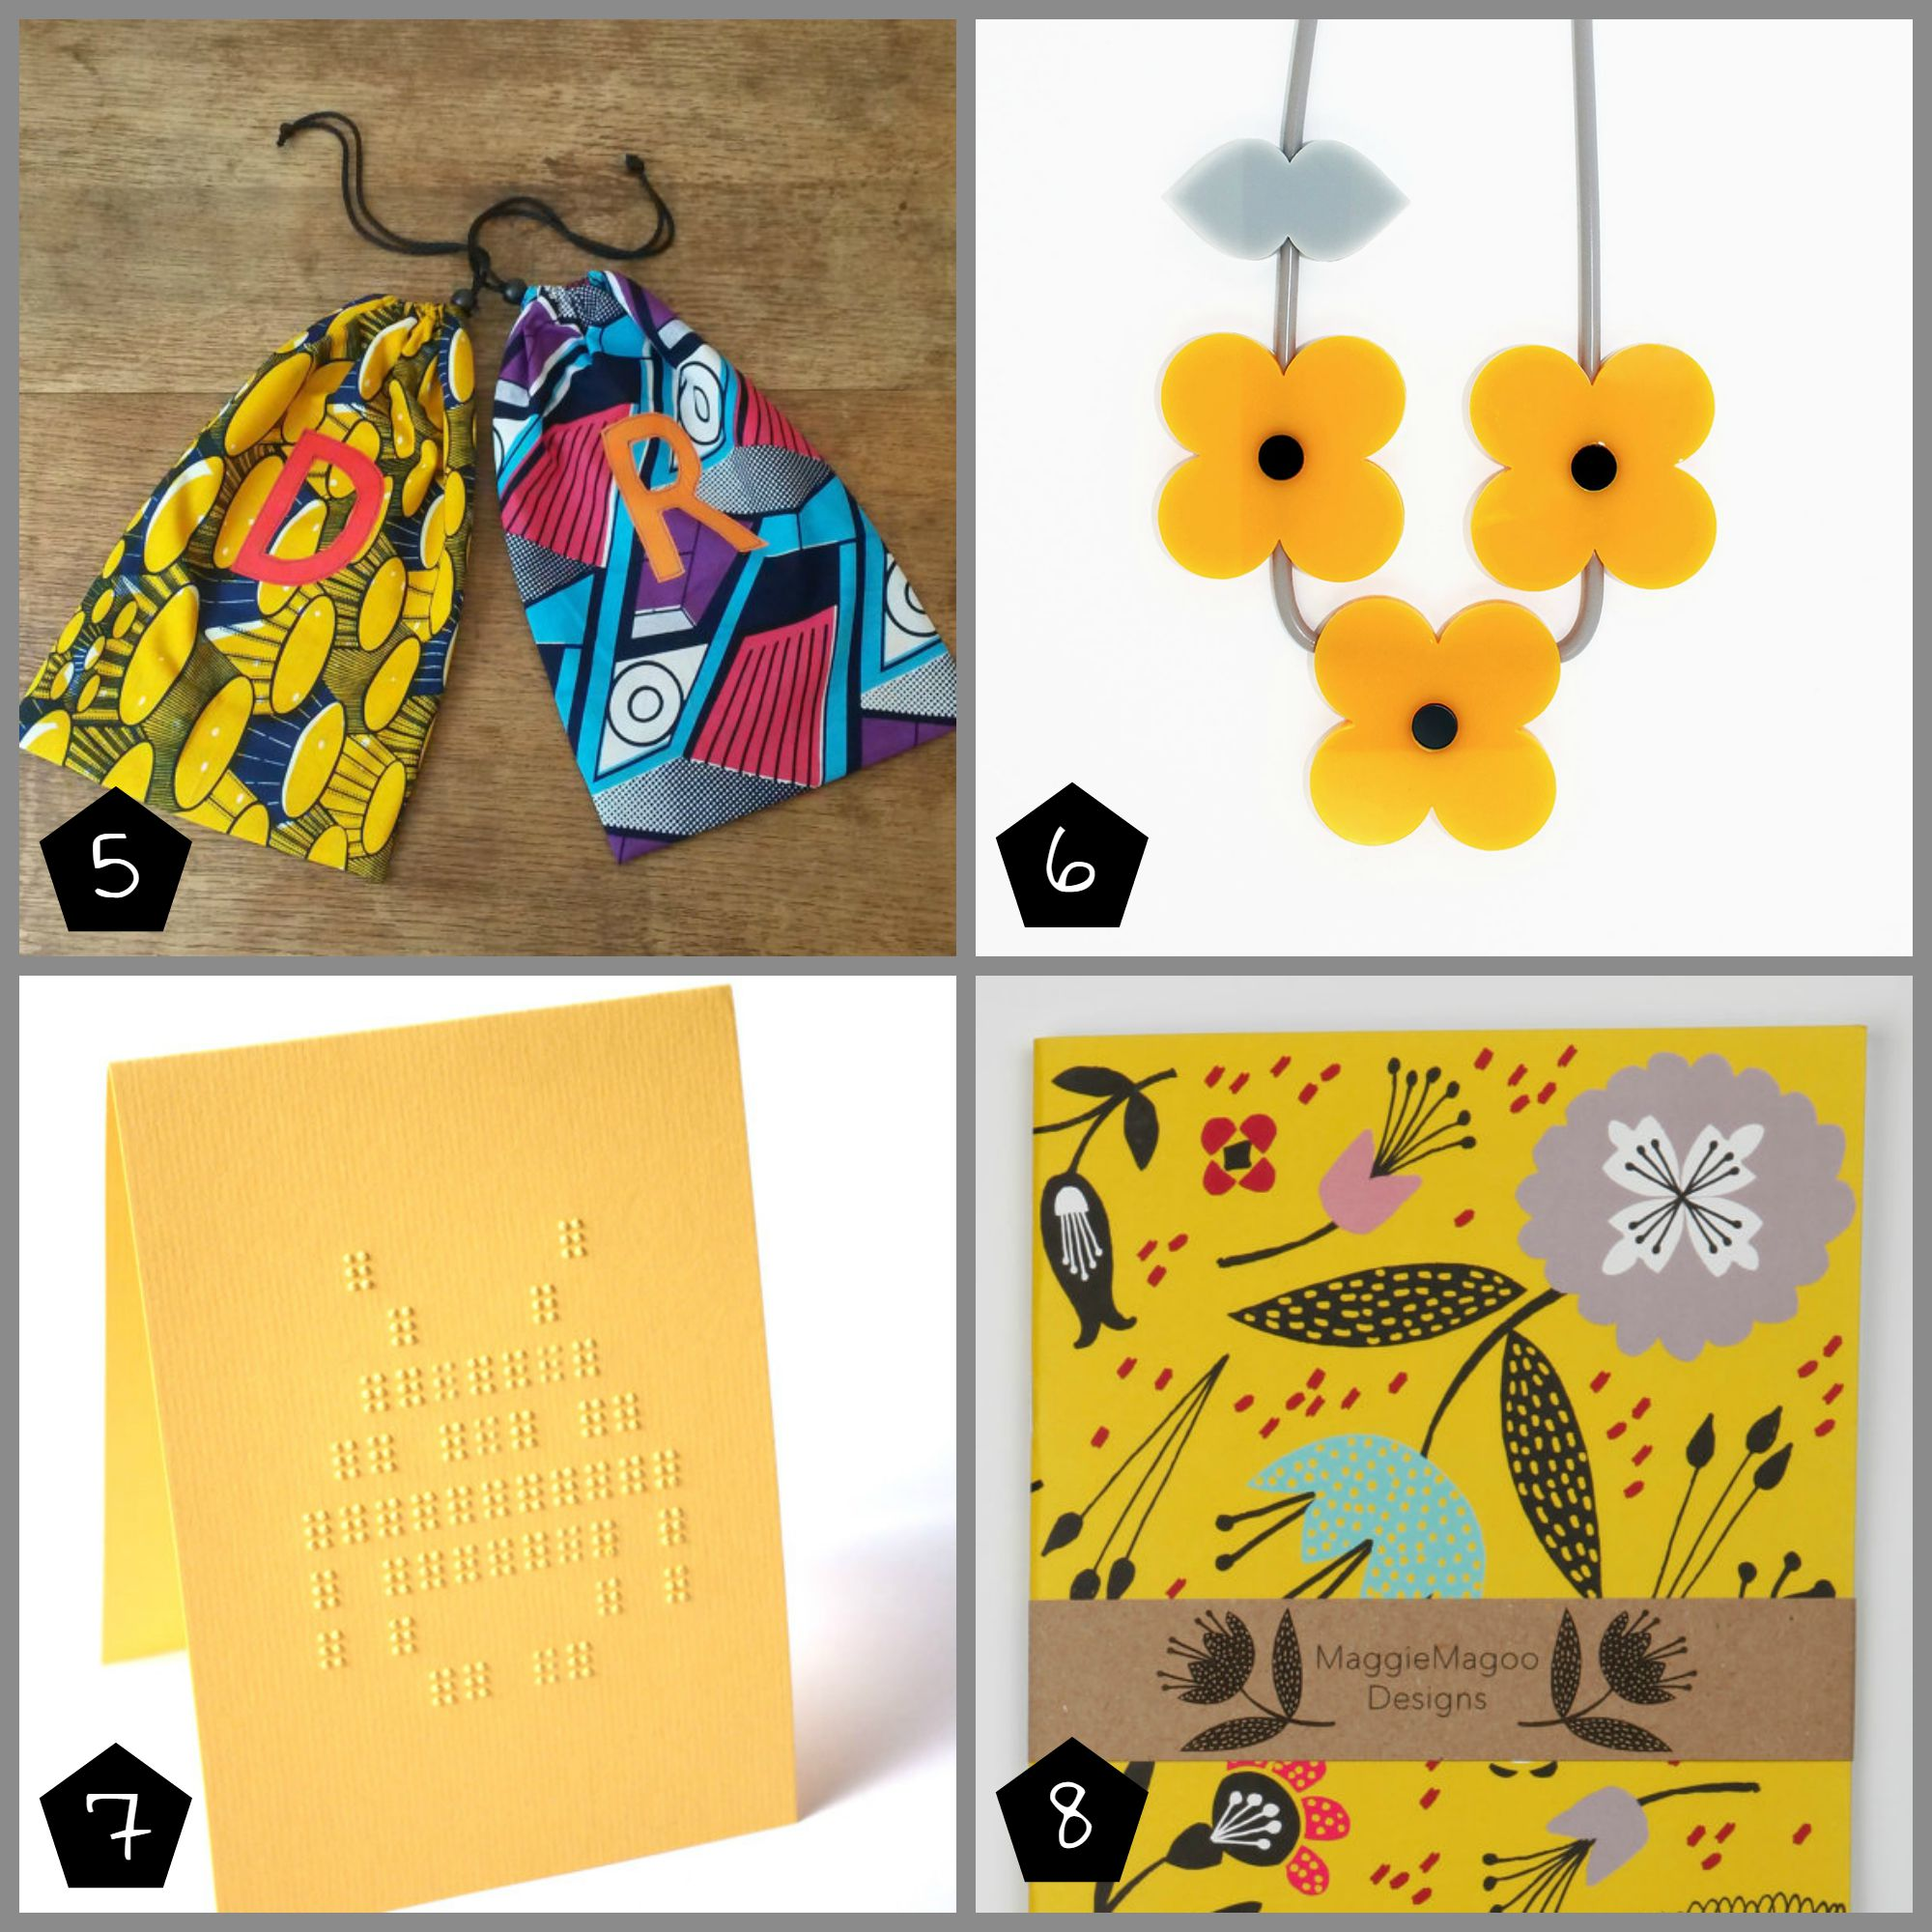 5. Little Prints Clothing  (Brixton - Sunday 4 Oct,Peckham - Sunday 11 Oct), 6. Iris De La Torre  (Shoreditch -Saturday 26 and Sunday 27, Peckham -Saturday 10 Oct), 7. Beth Lau Braille  ( Shoreditch -  Saturday 26 and   Sunday 27), 8.  MaggieMagoo Designs  (Peckham - Sunday 11 Oct)